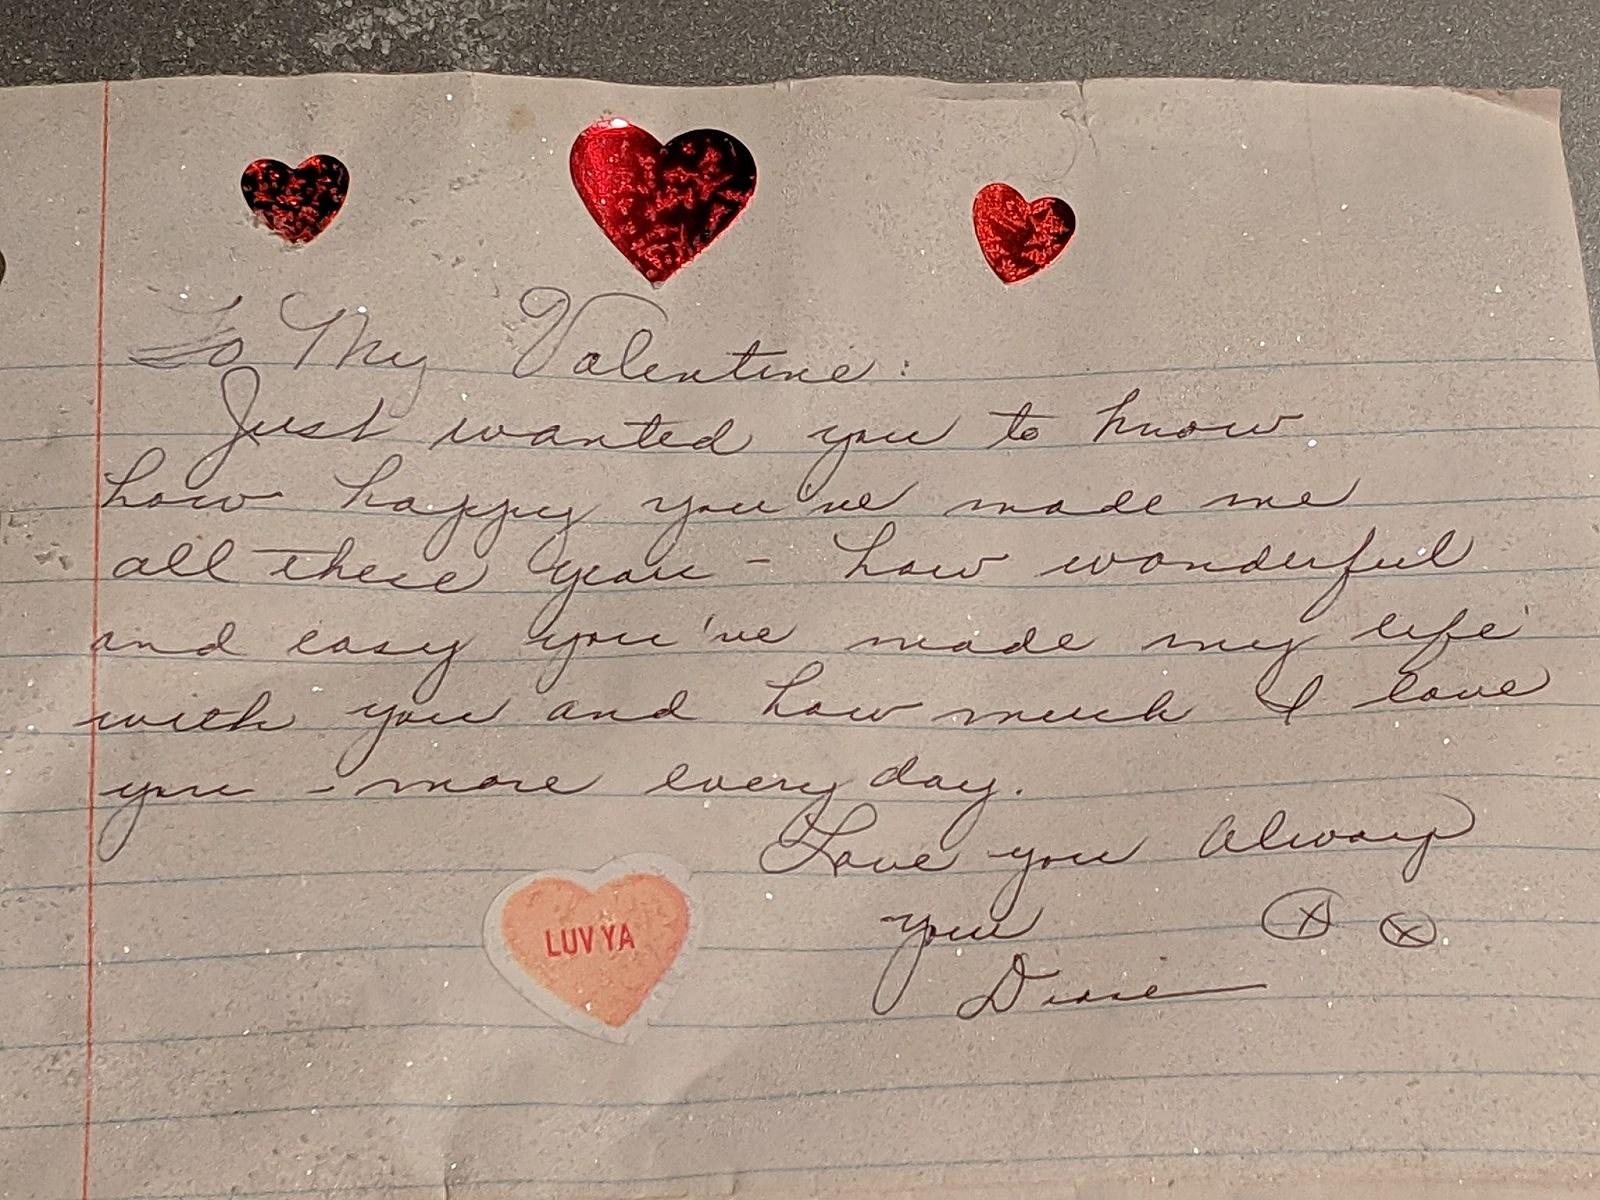 Love letter found in snow byron minnesota diane